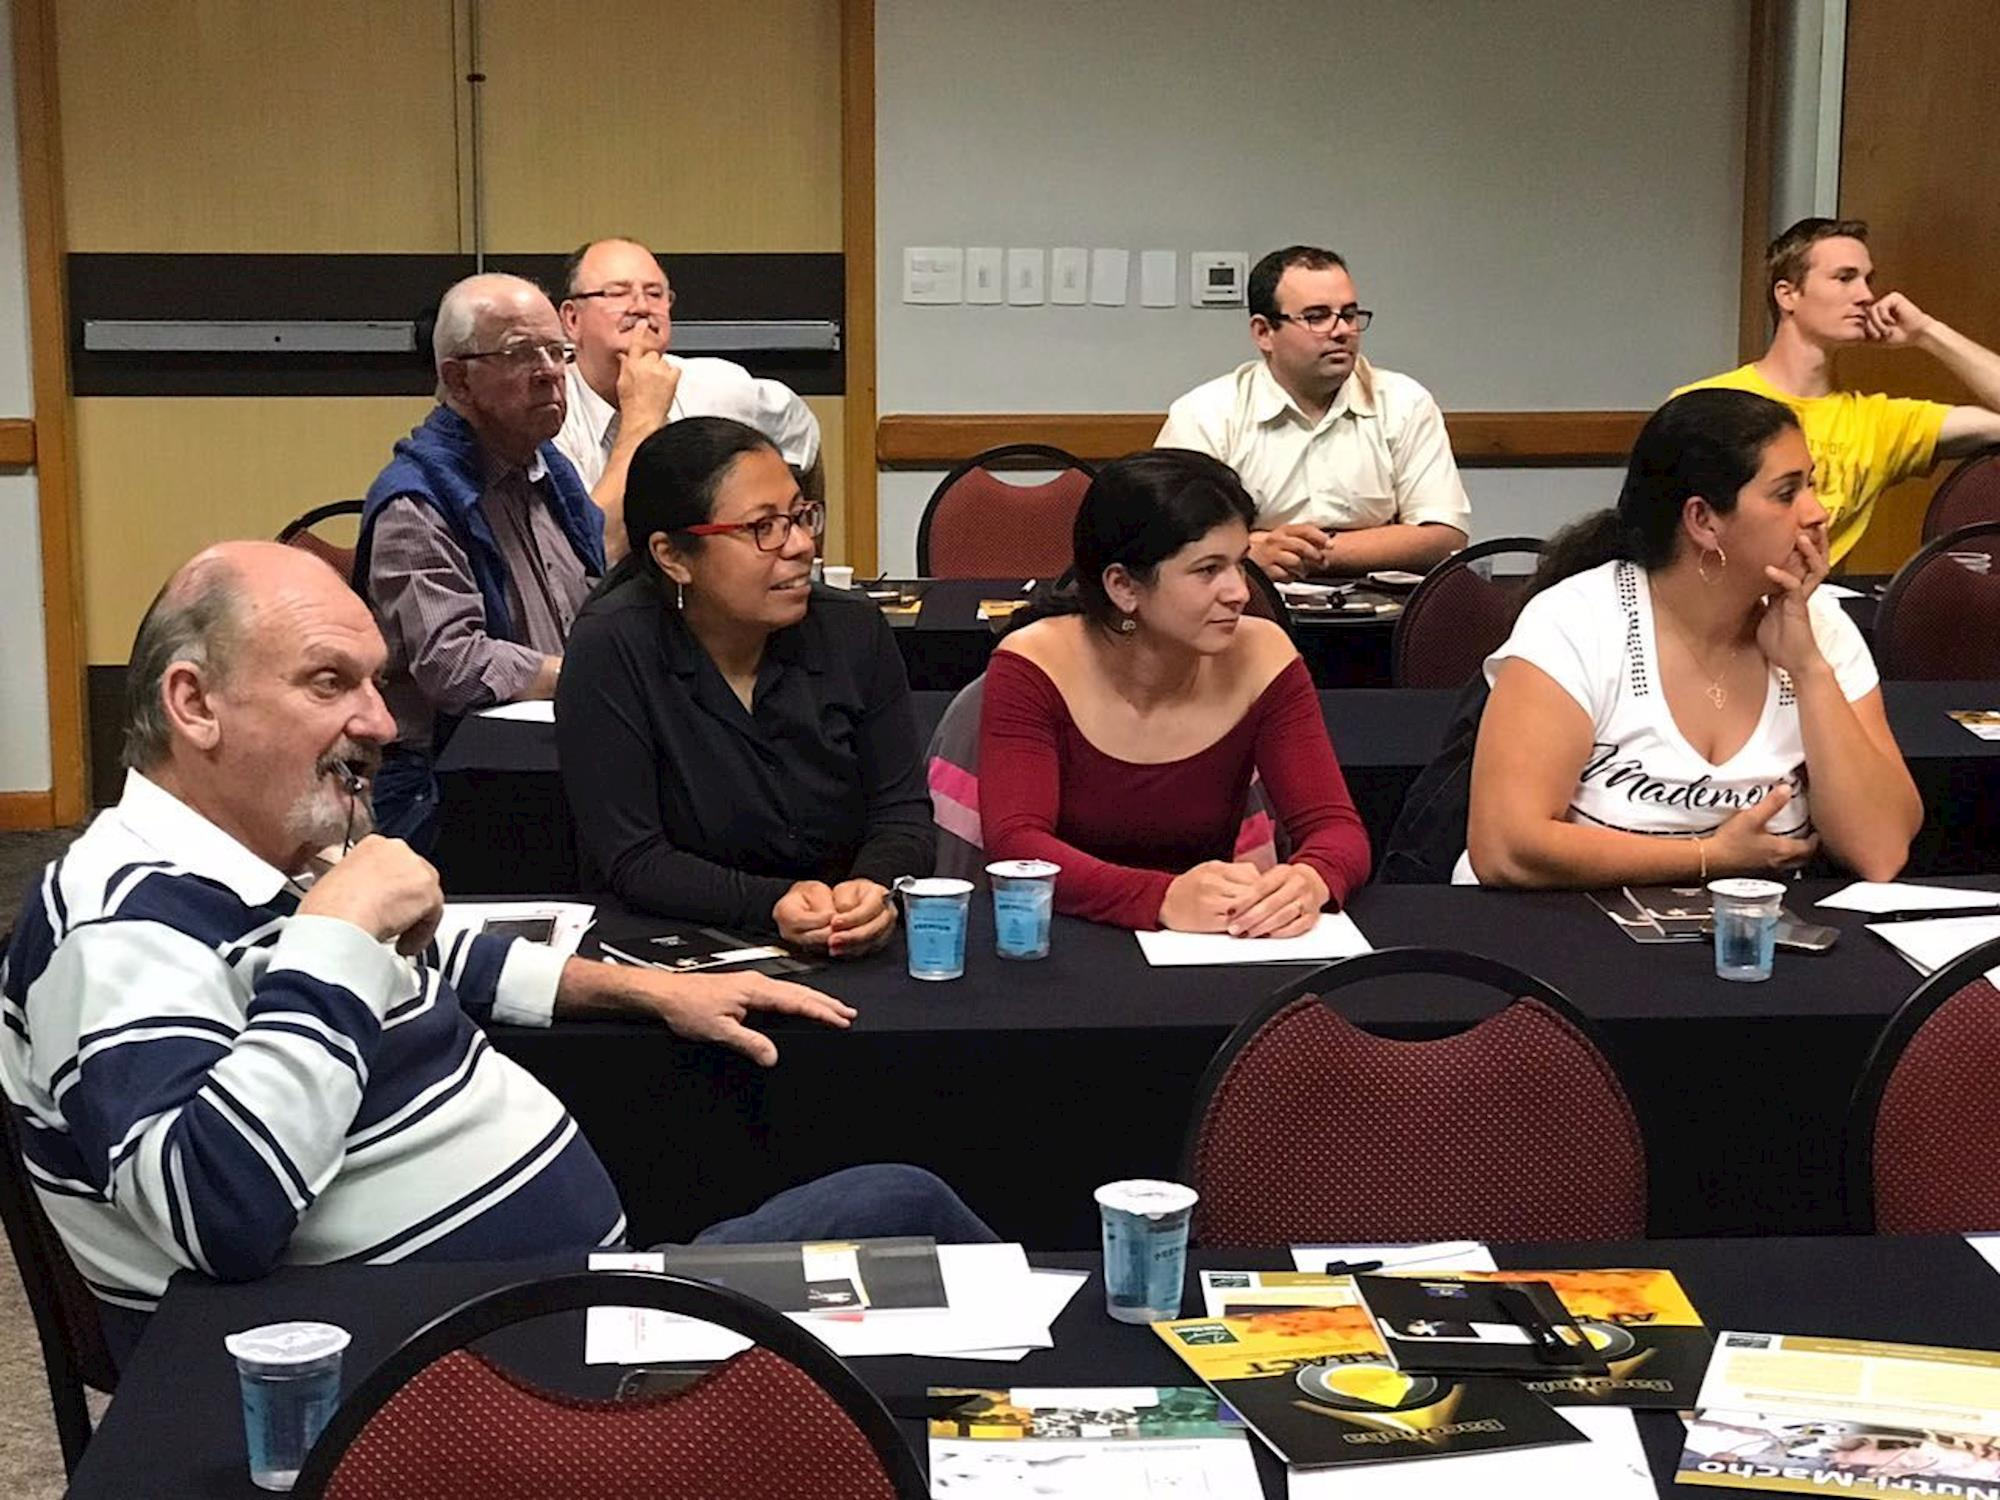 Workshop Suíno Paulista reúne profissionais da suinocultura em Campinas , Workshop Suíno Paulista reúne profissionais da suinocultura em Campinas